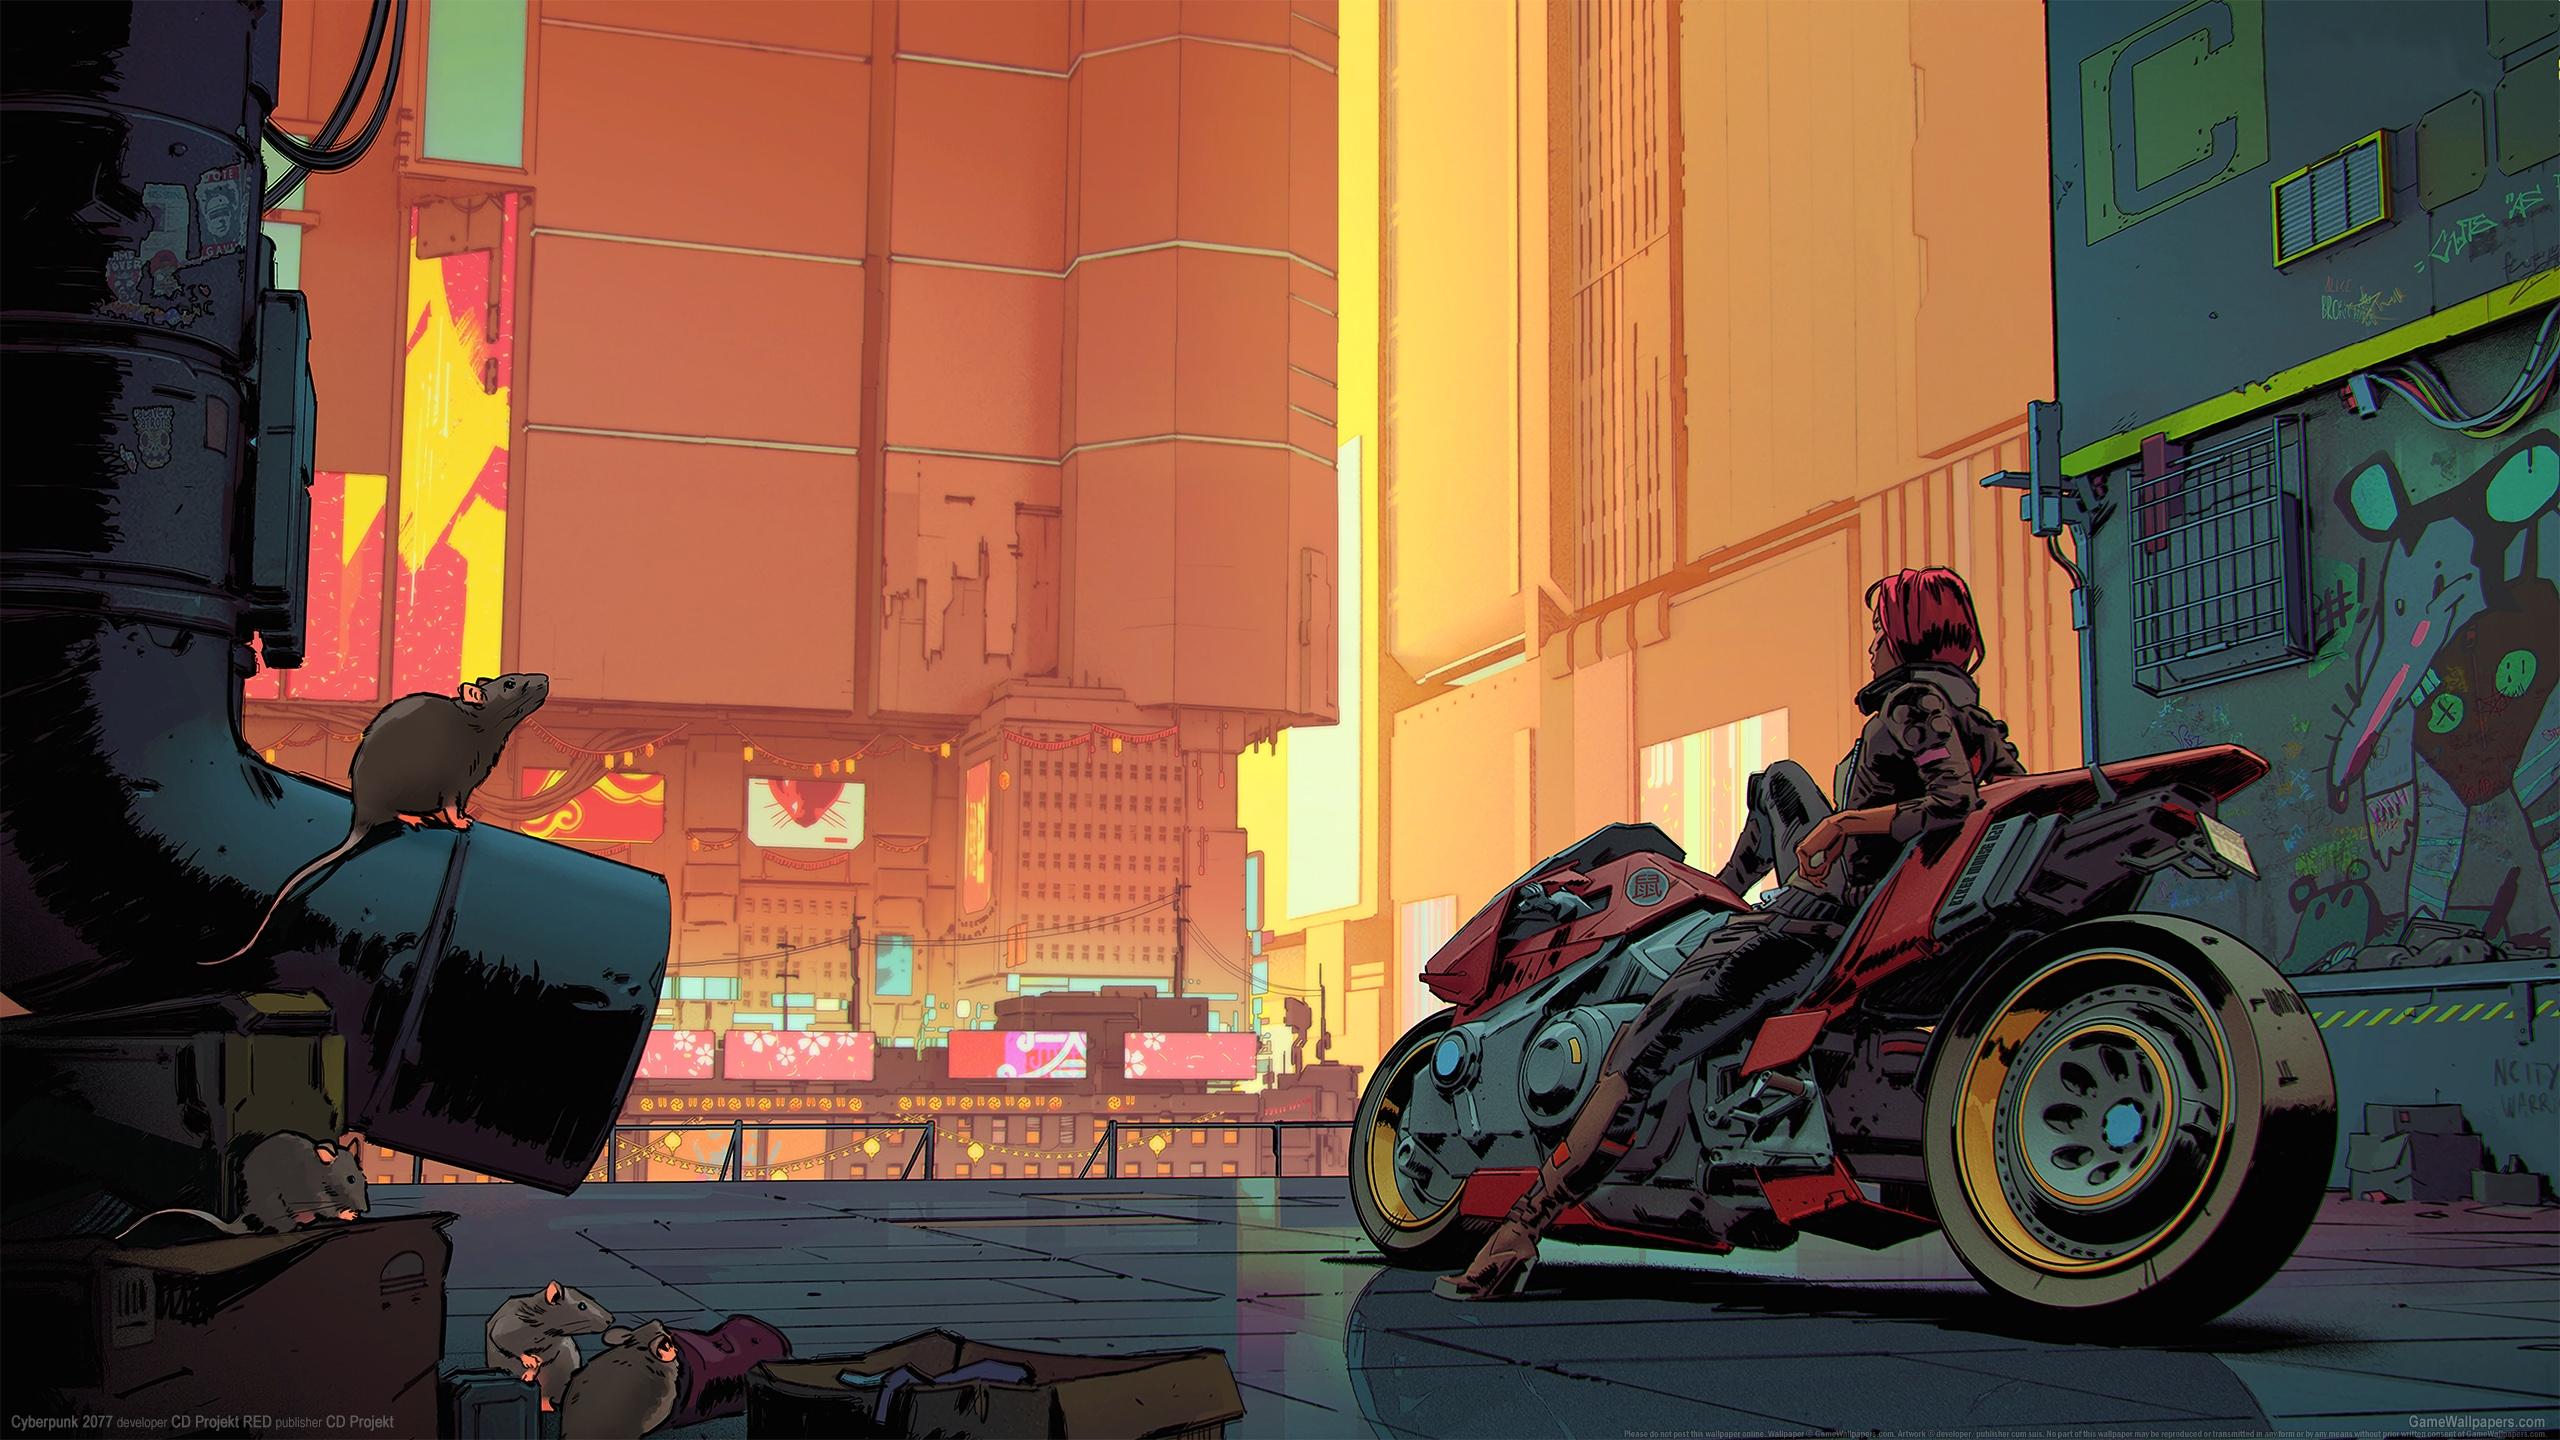 Cyberpunk 2077 2560x1440 Hintergrundbild 27